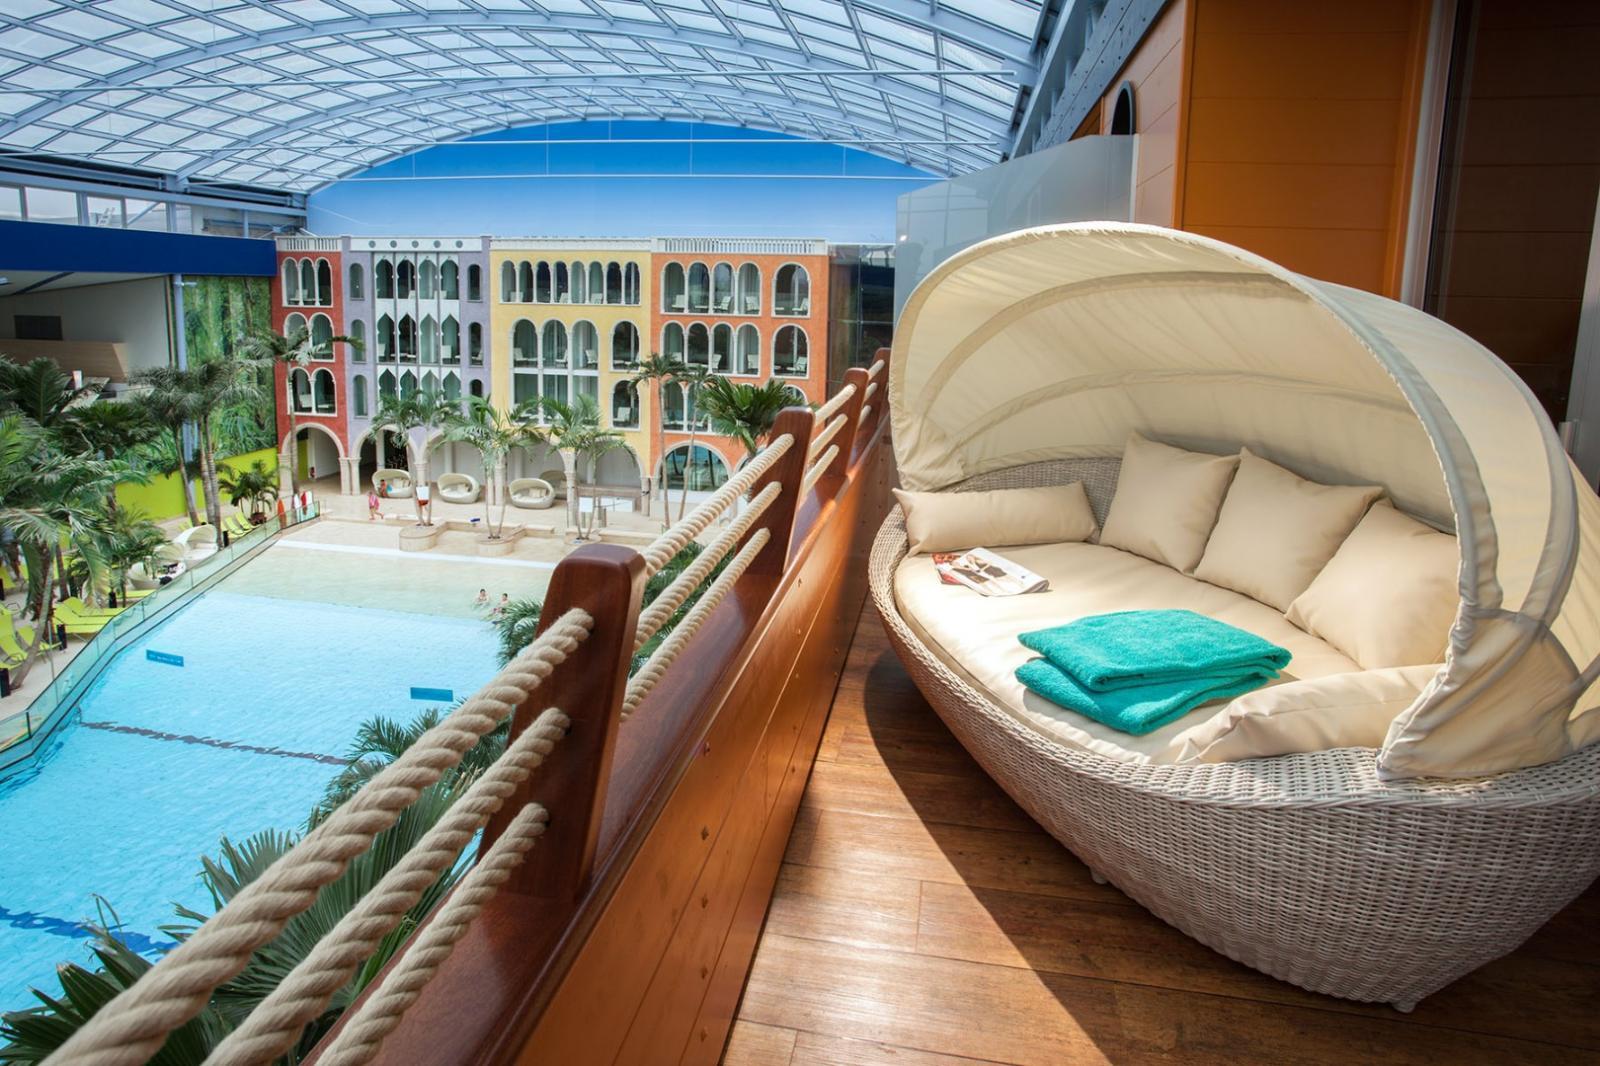 hotel victory therme erding bilder vom wellnesshotel. Black Bedroom Furniture Sets. Home Design Ideas